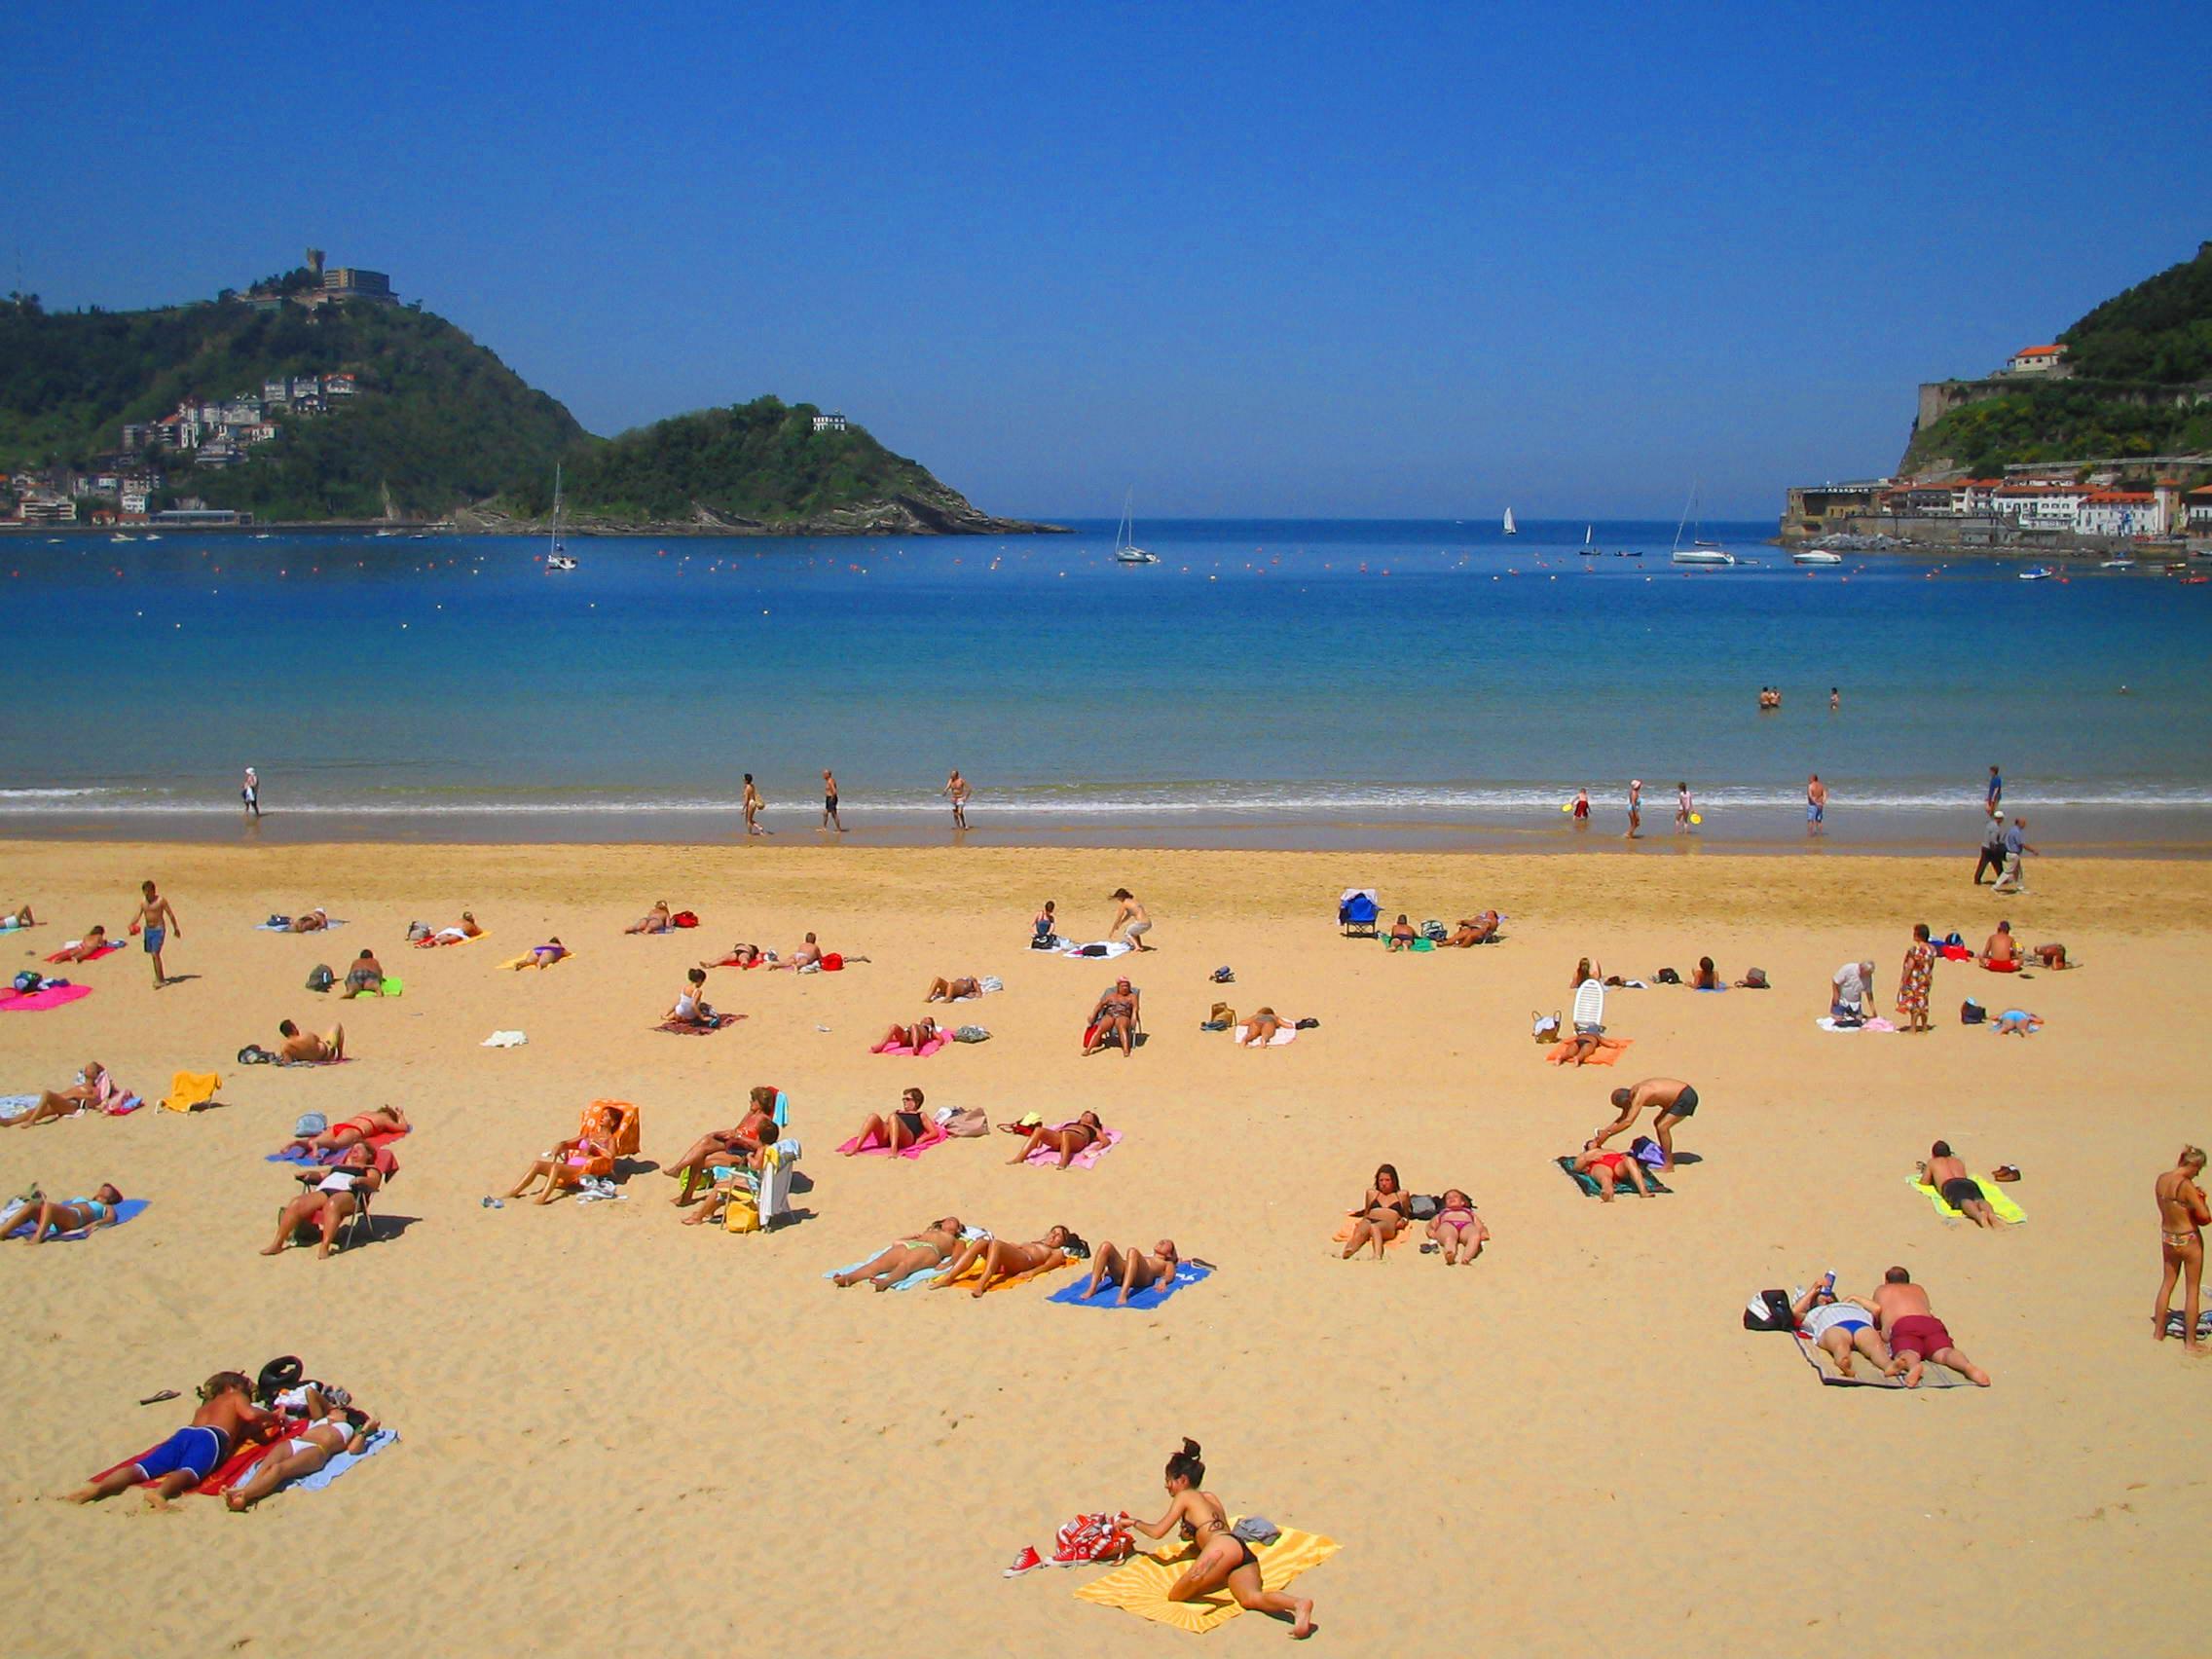 File:San Sebastian Playa de la Concha - panoramio.jpg - Wikimedia Commons